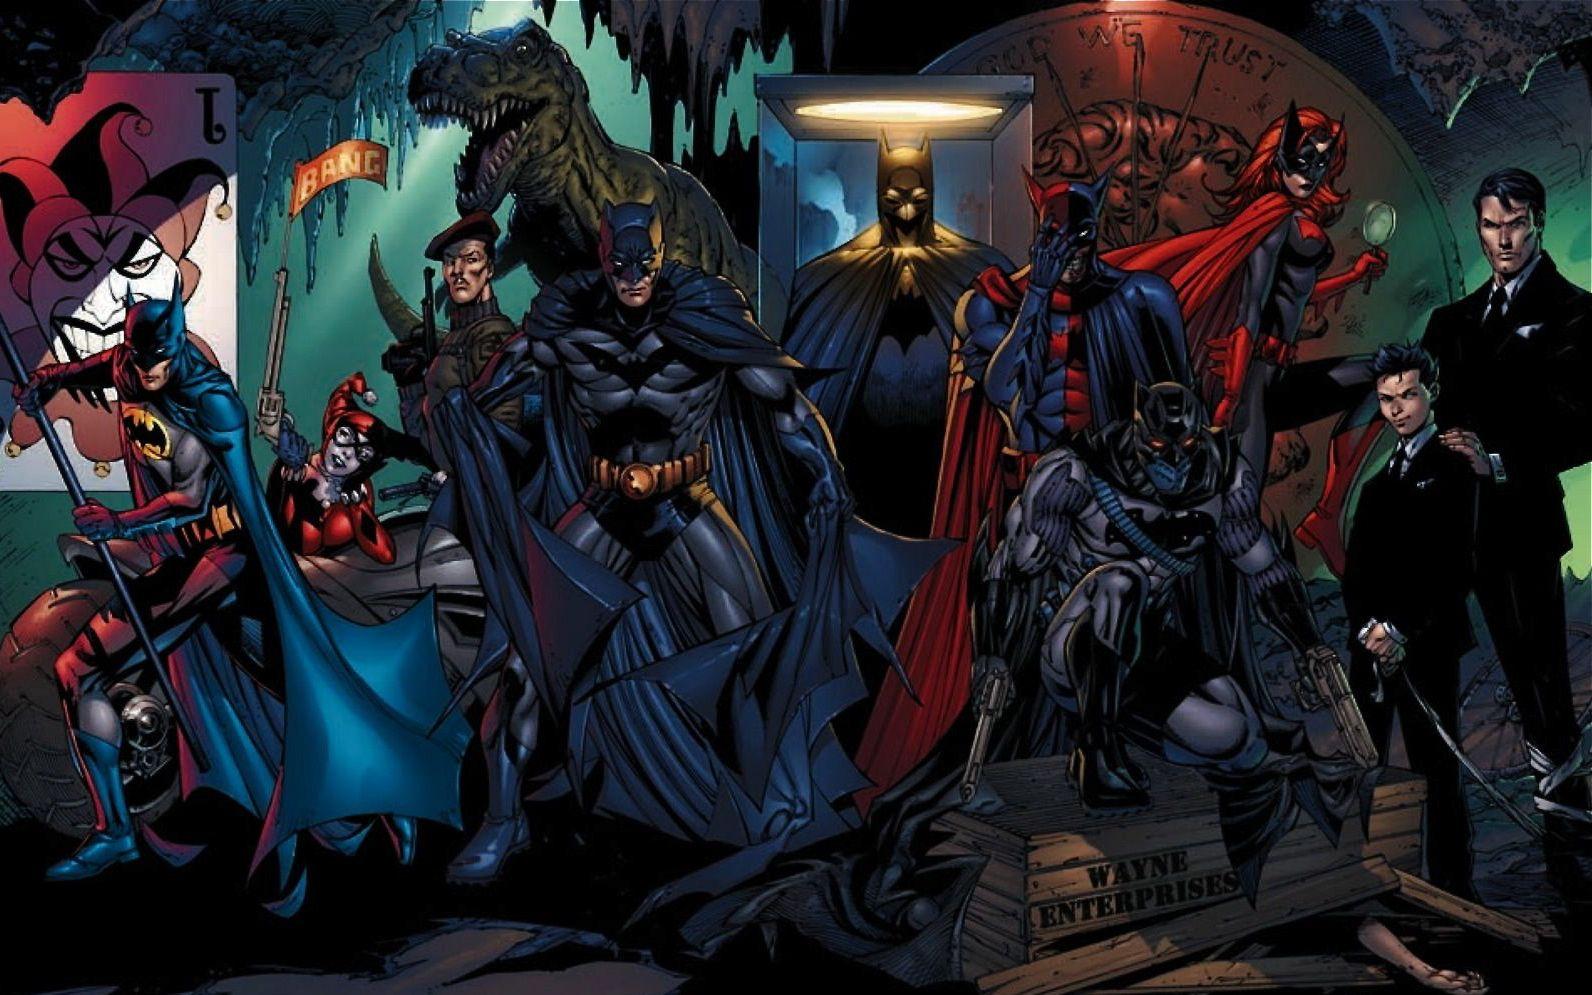 batman comics hd wallpapers backgrounds wallpaper | wallpapers